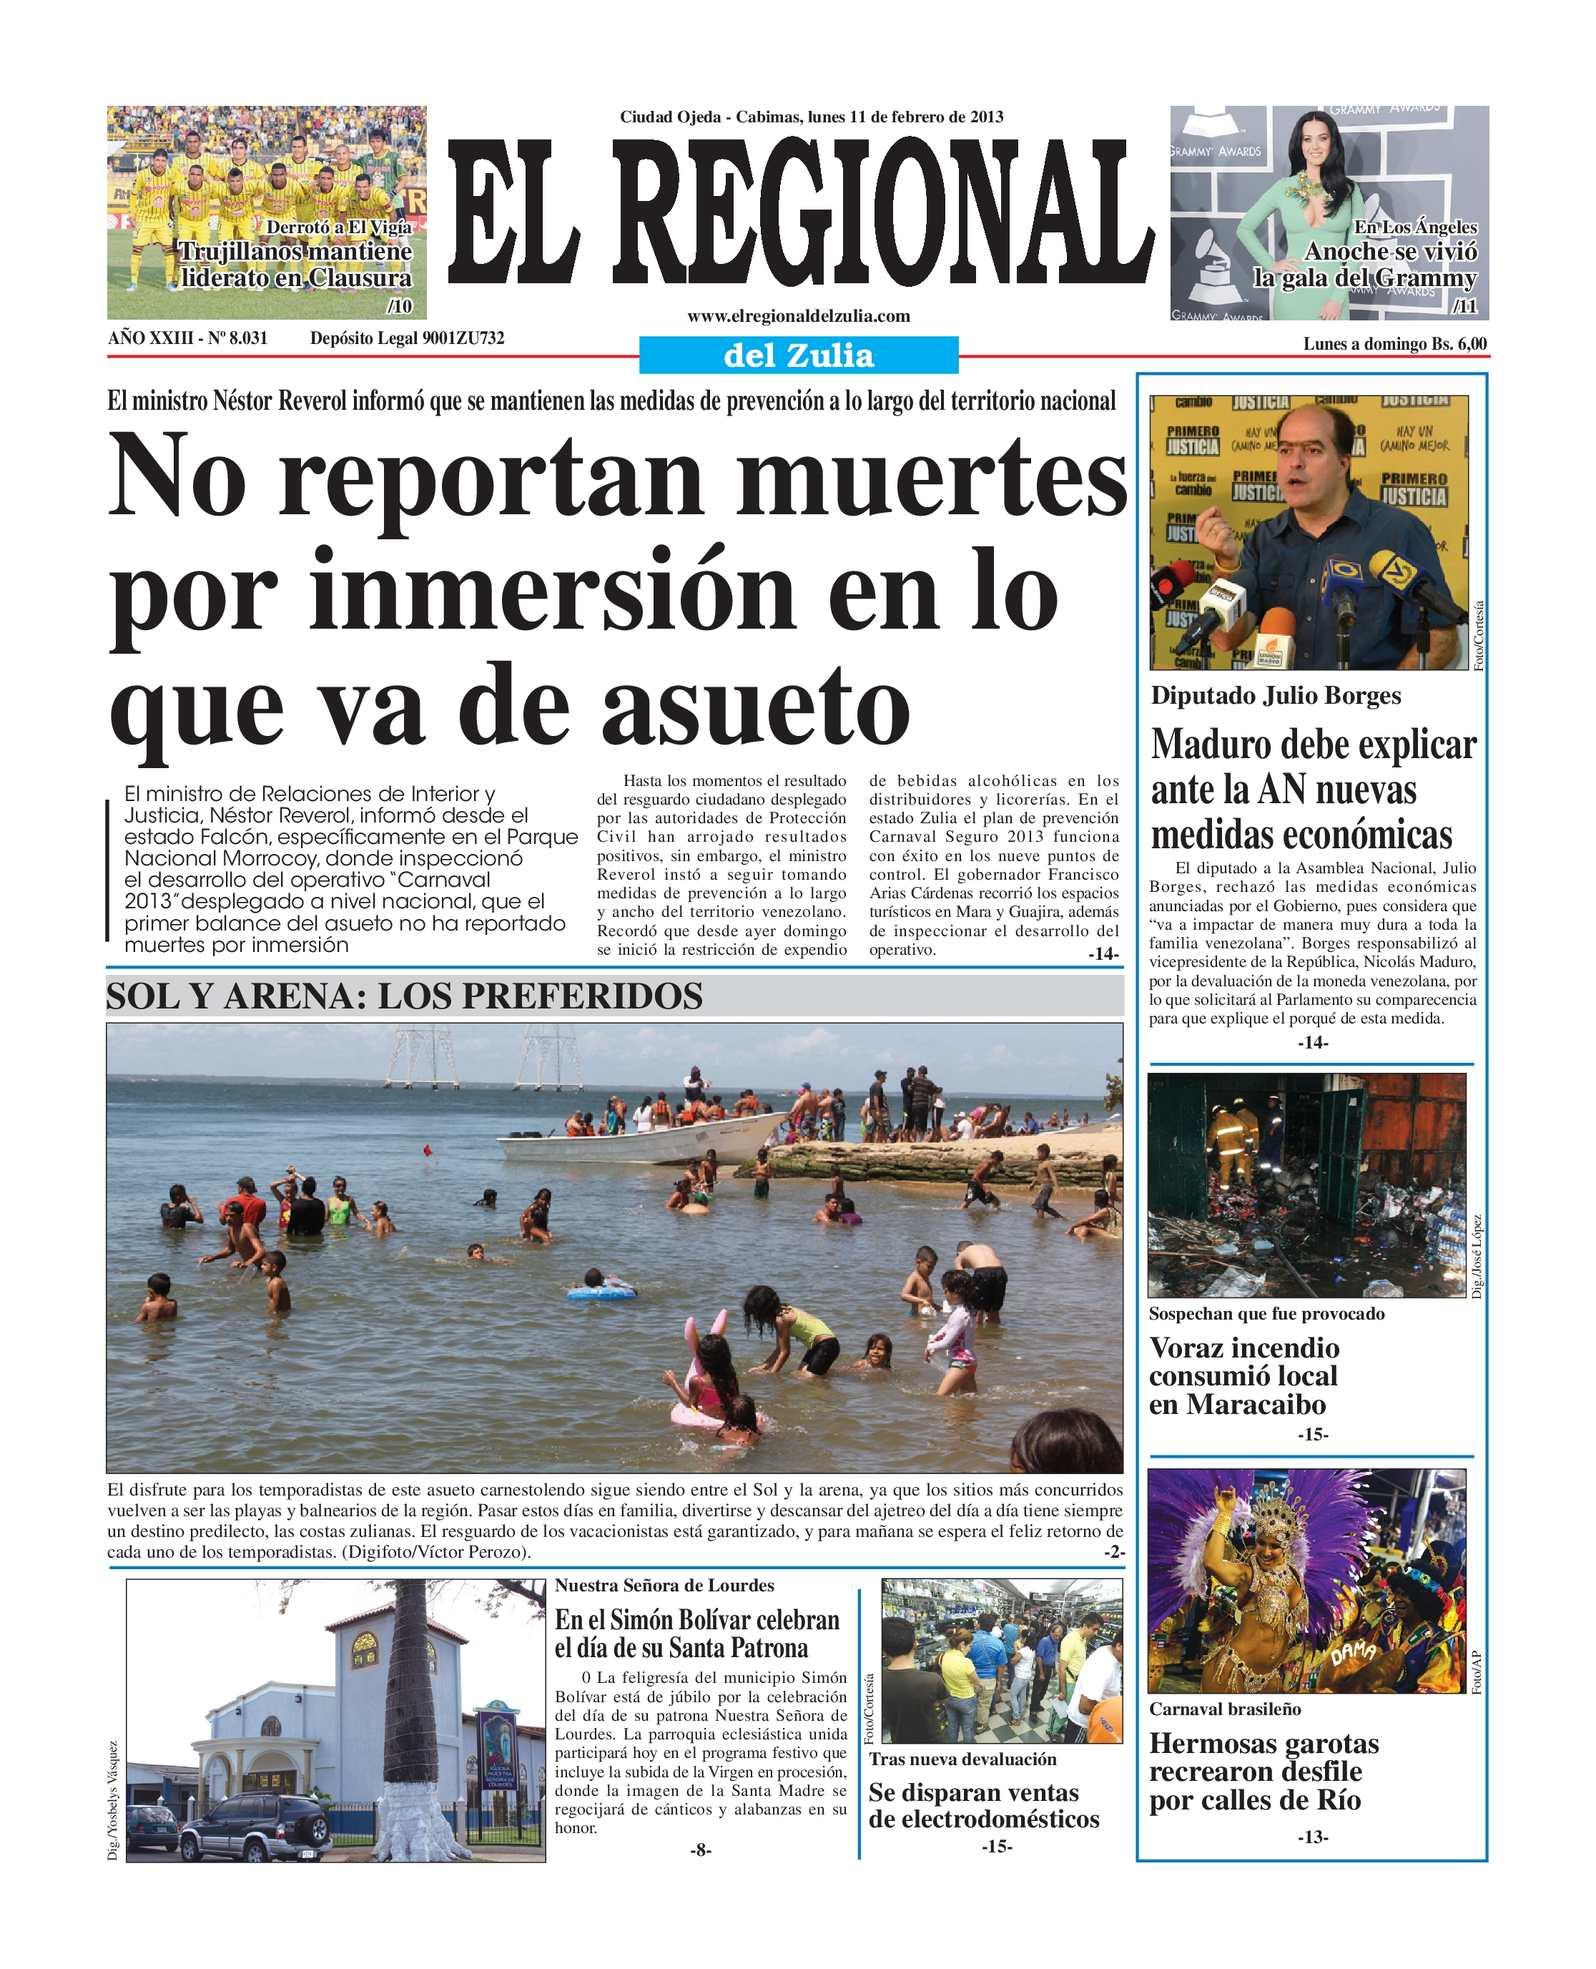 Calaméo - El Regional del Zulia 11-02-2013